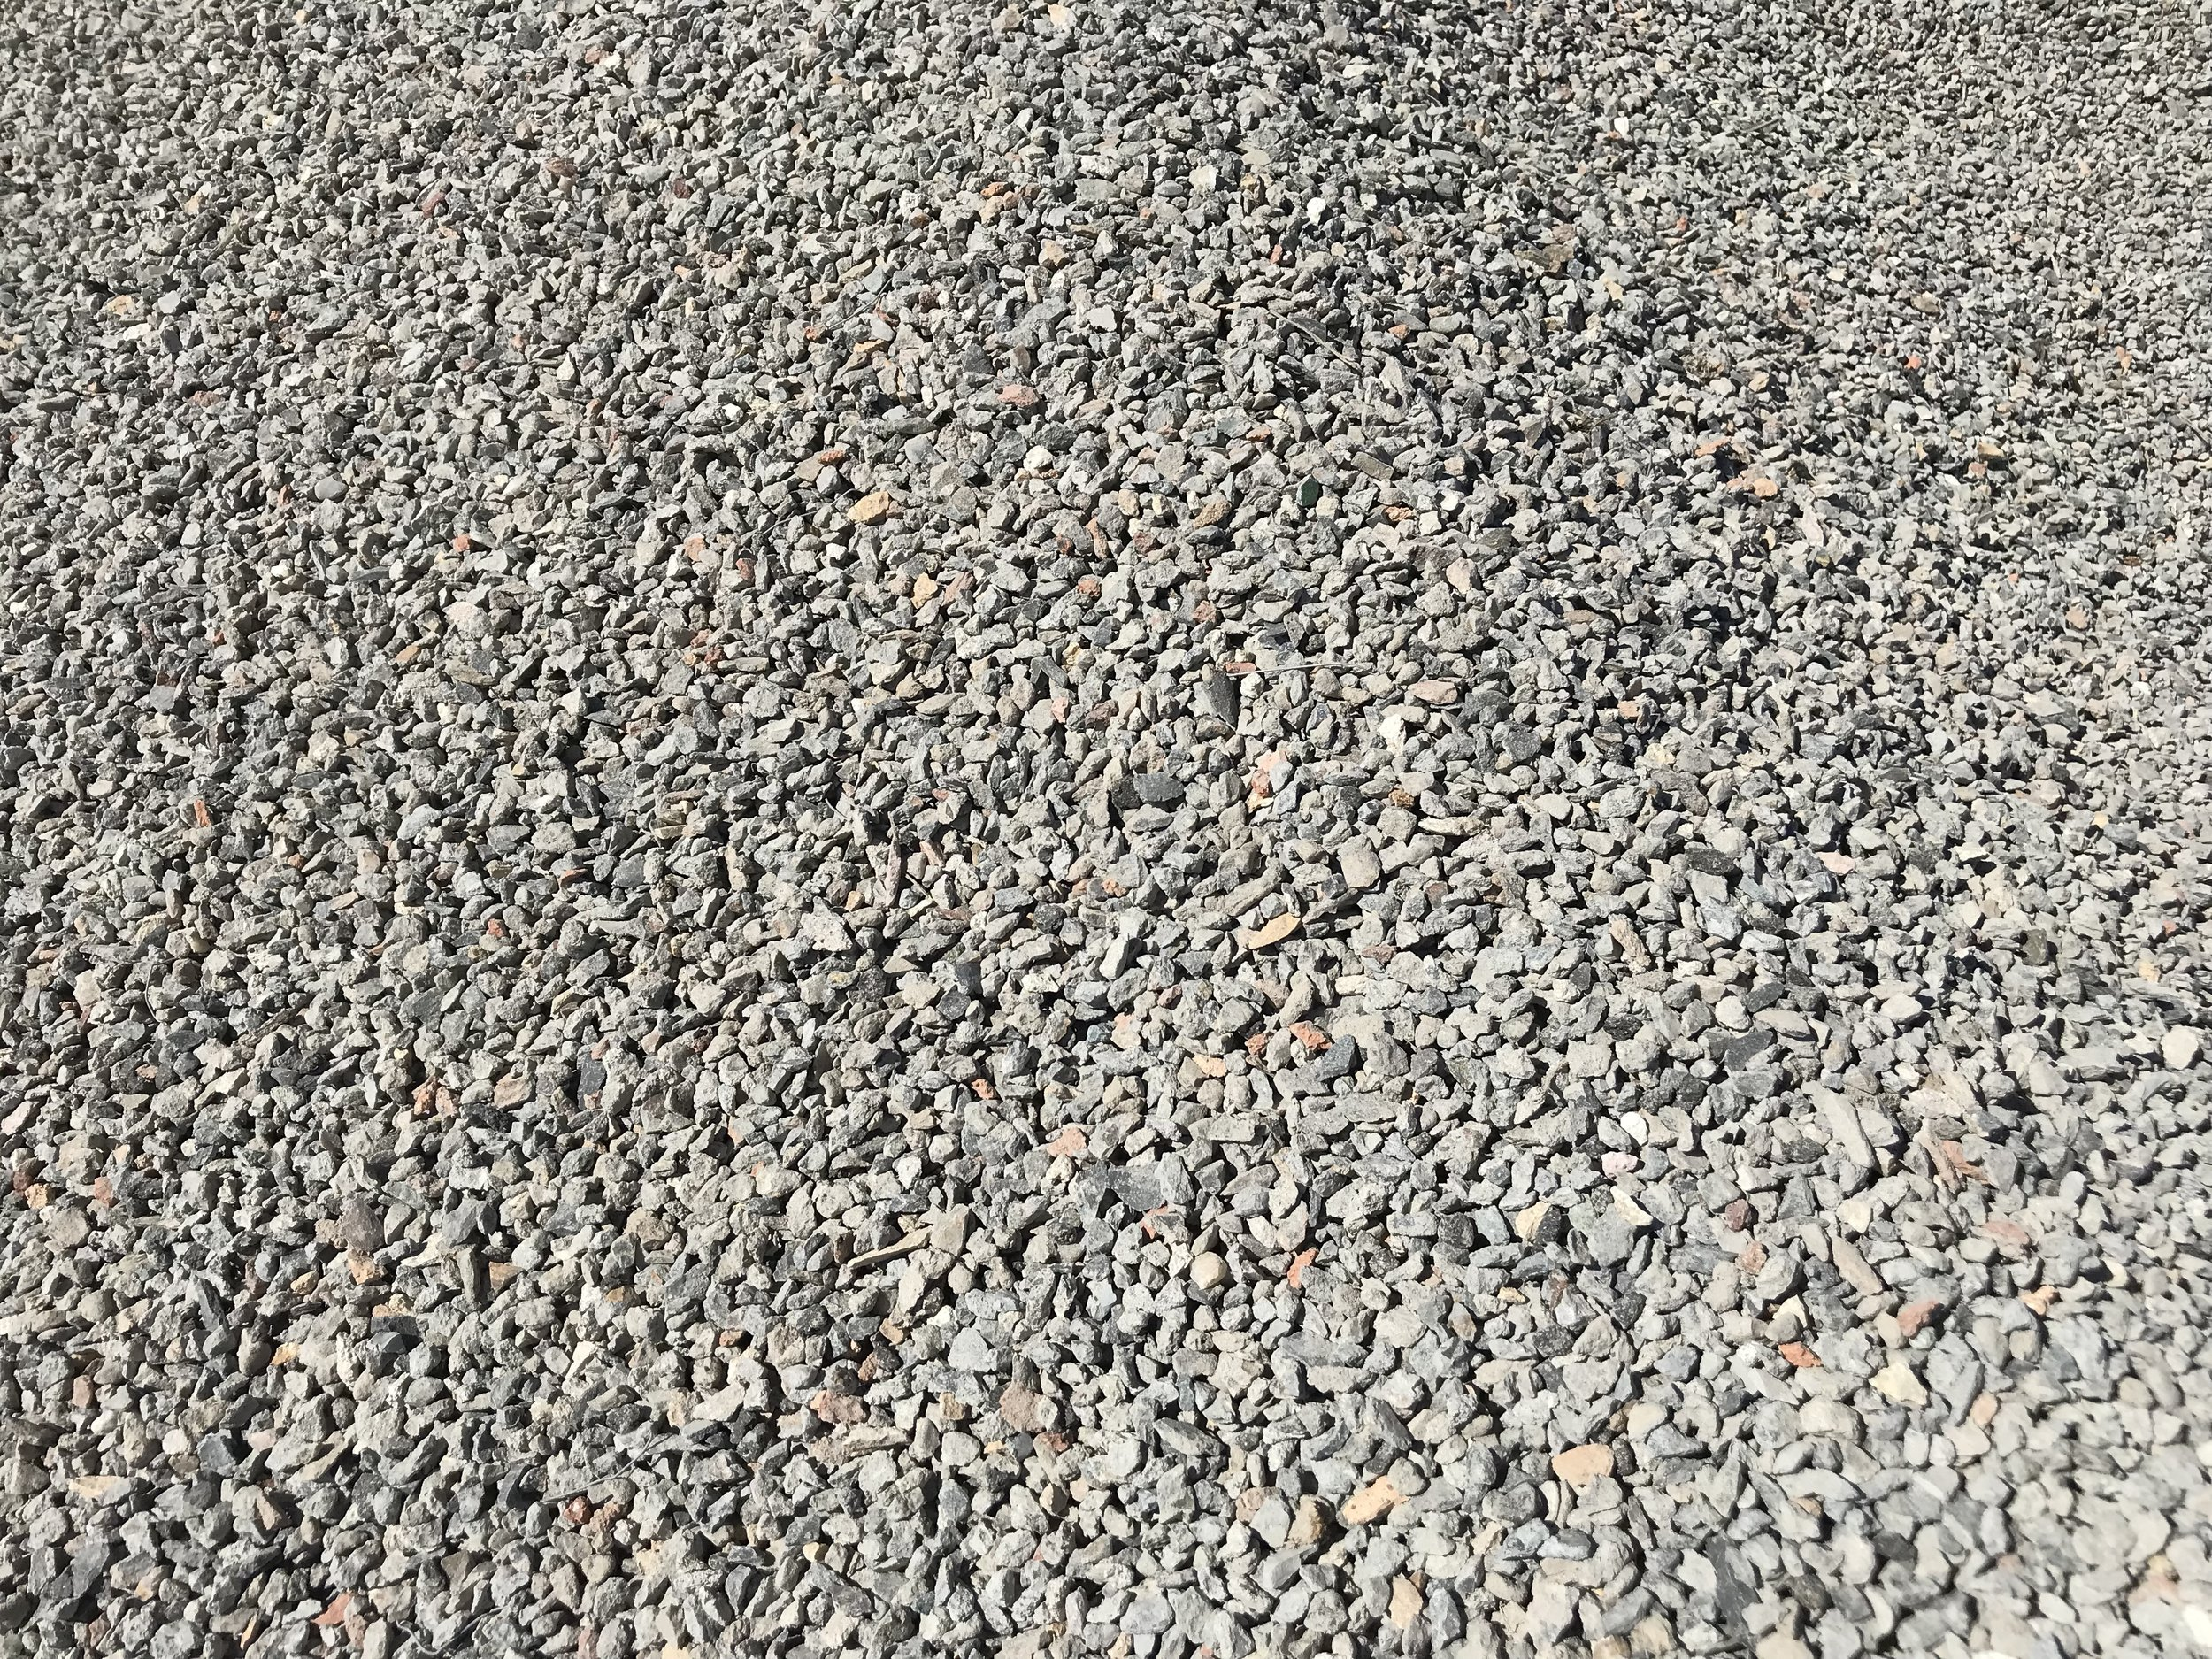 drainage gravel 5mm / 10mm / 20mm / 40mm / 50-75mm